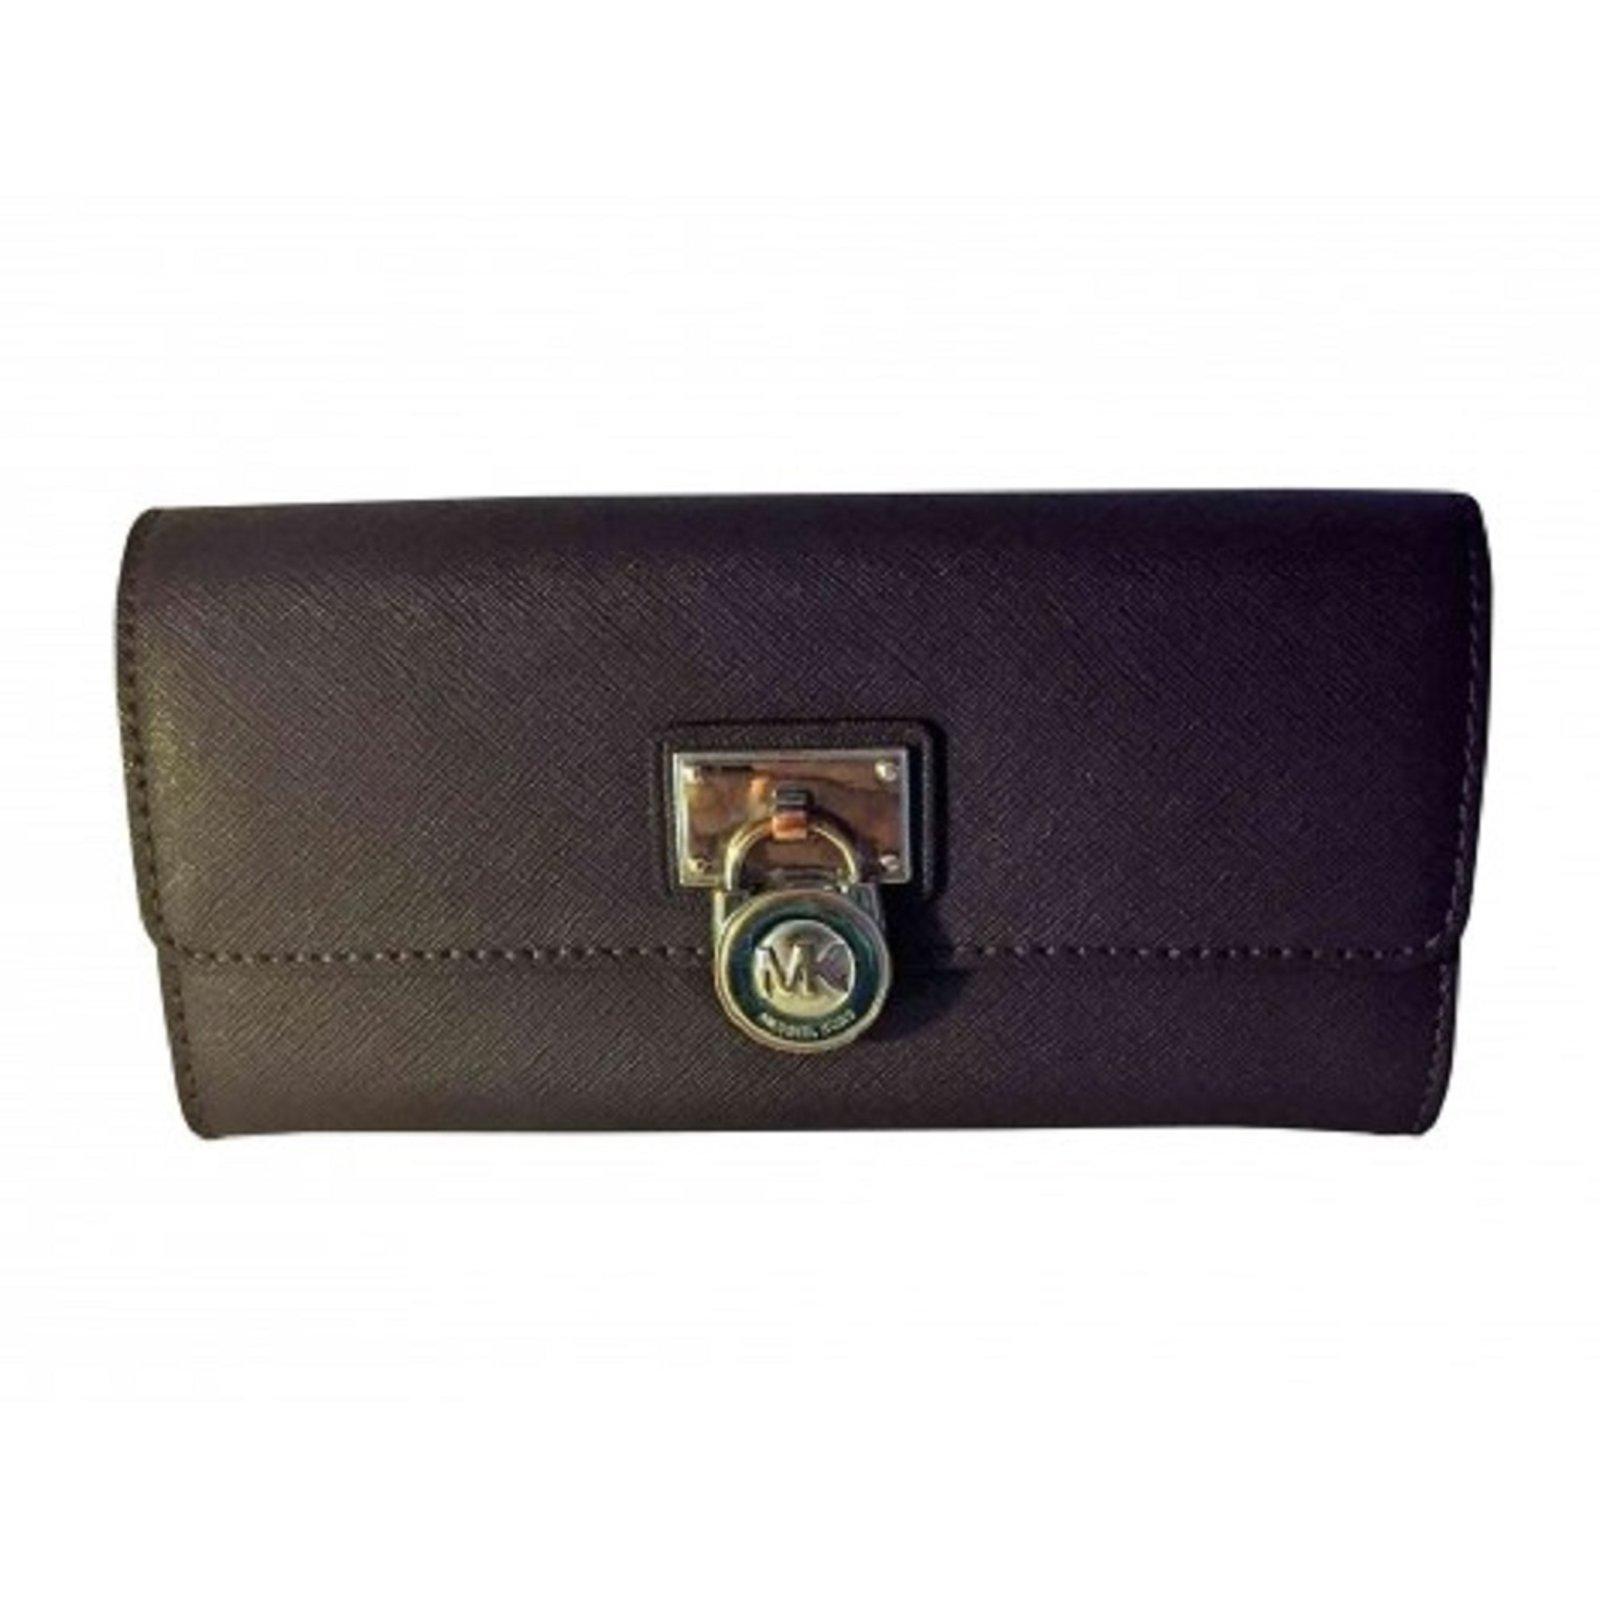 a5a7c2f54266 Michael Kors wallets Wallets Leather Purple ref.73464 - Joli Closet